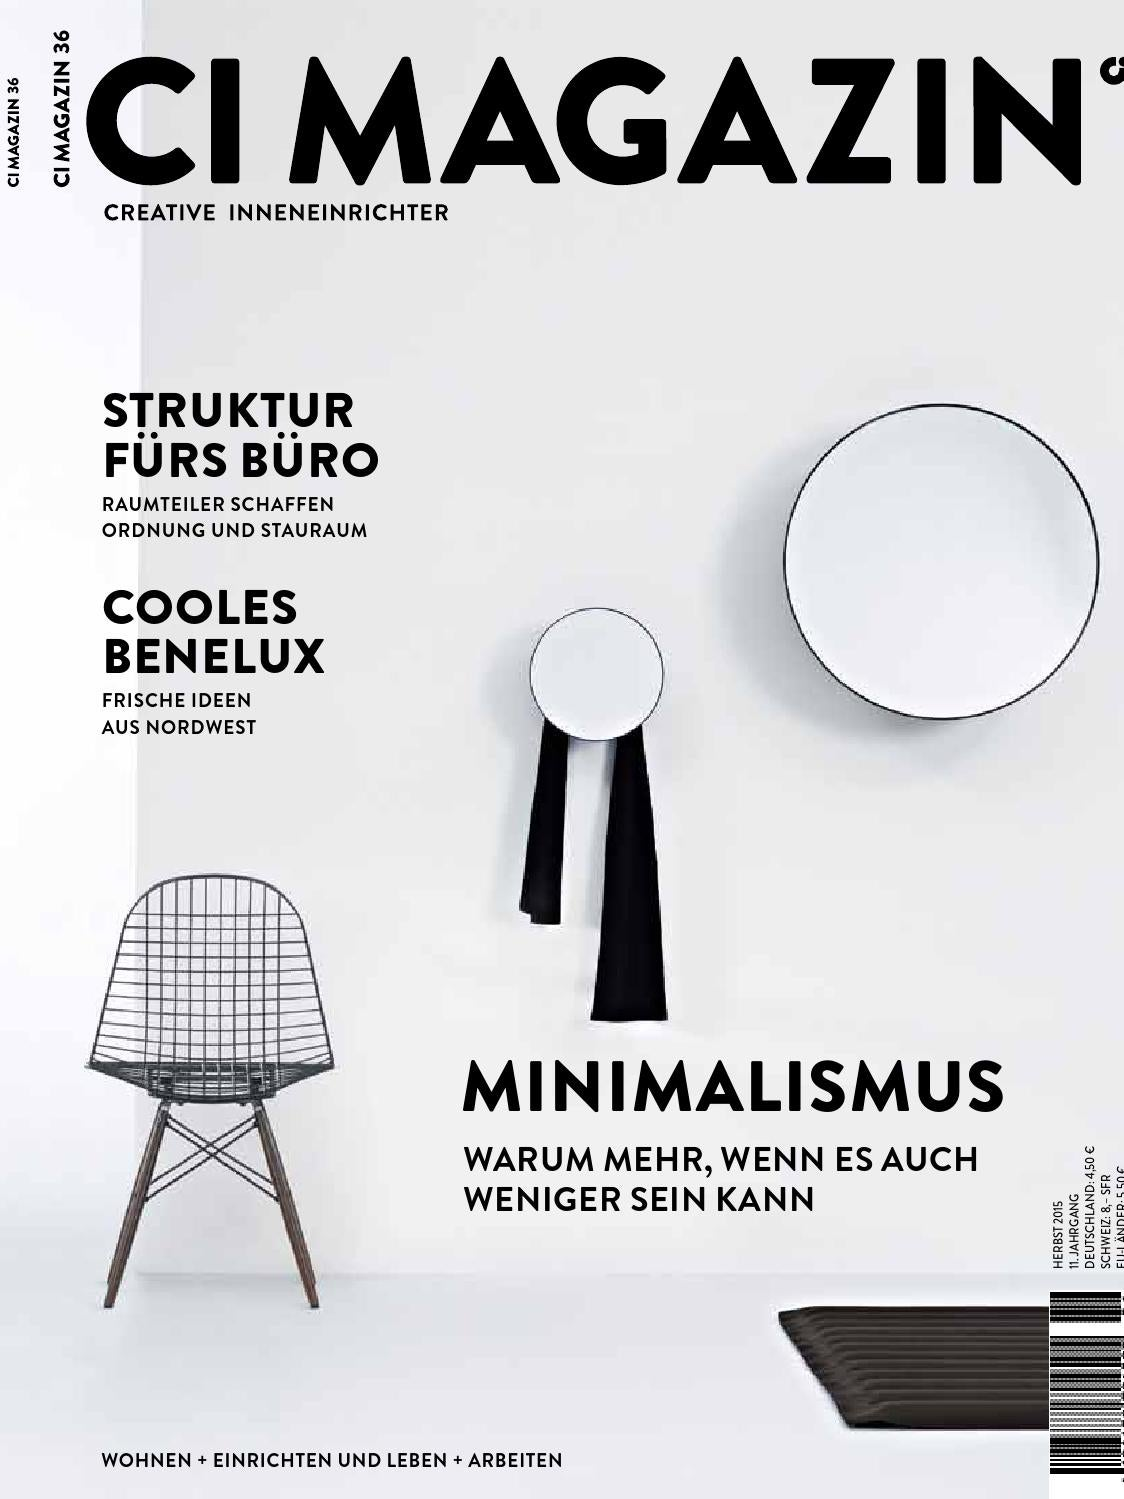 Gärtner Möbel Ci Magazin 36 By Gärtner Internationale Möbel Issuu